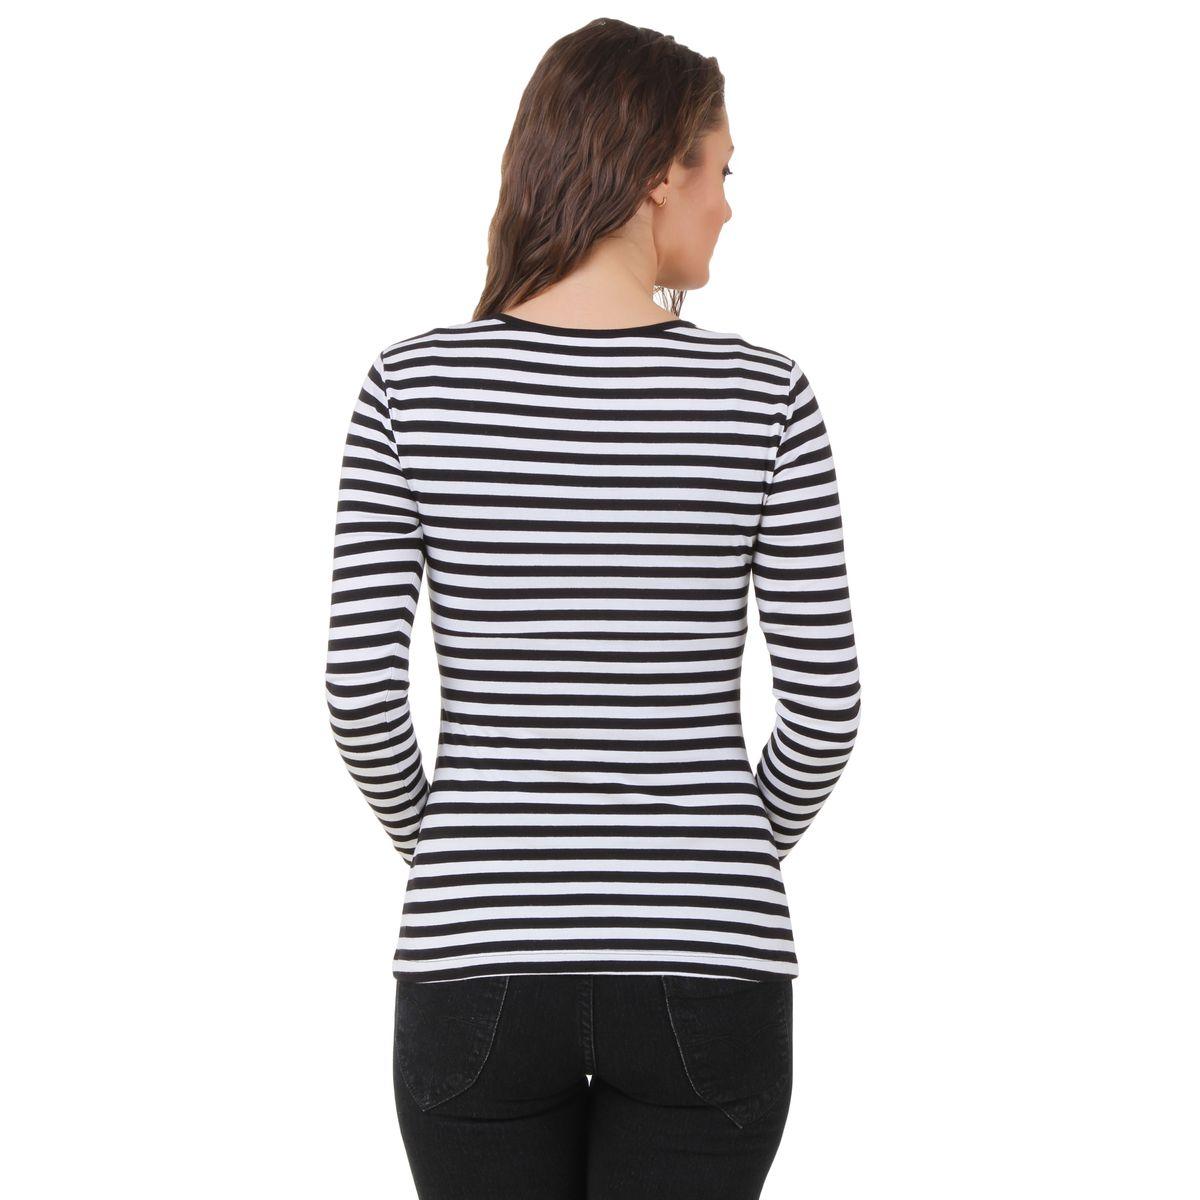 Texco Black and White Stripe Top